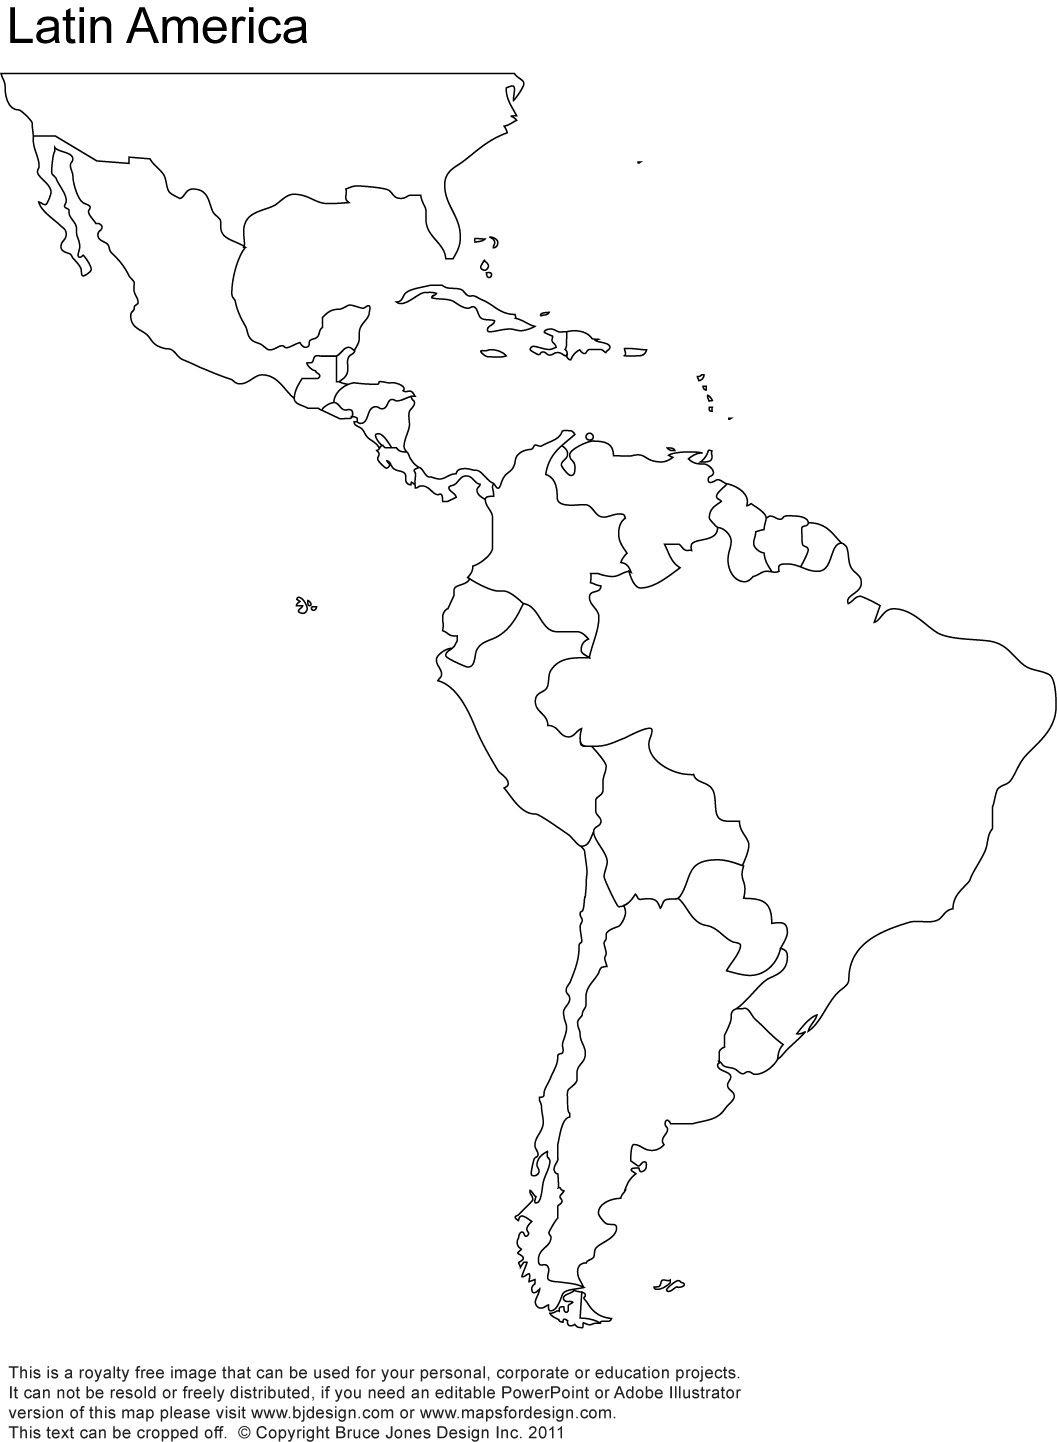 Latin America printable, blank map, south america, brazil ...